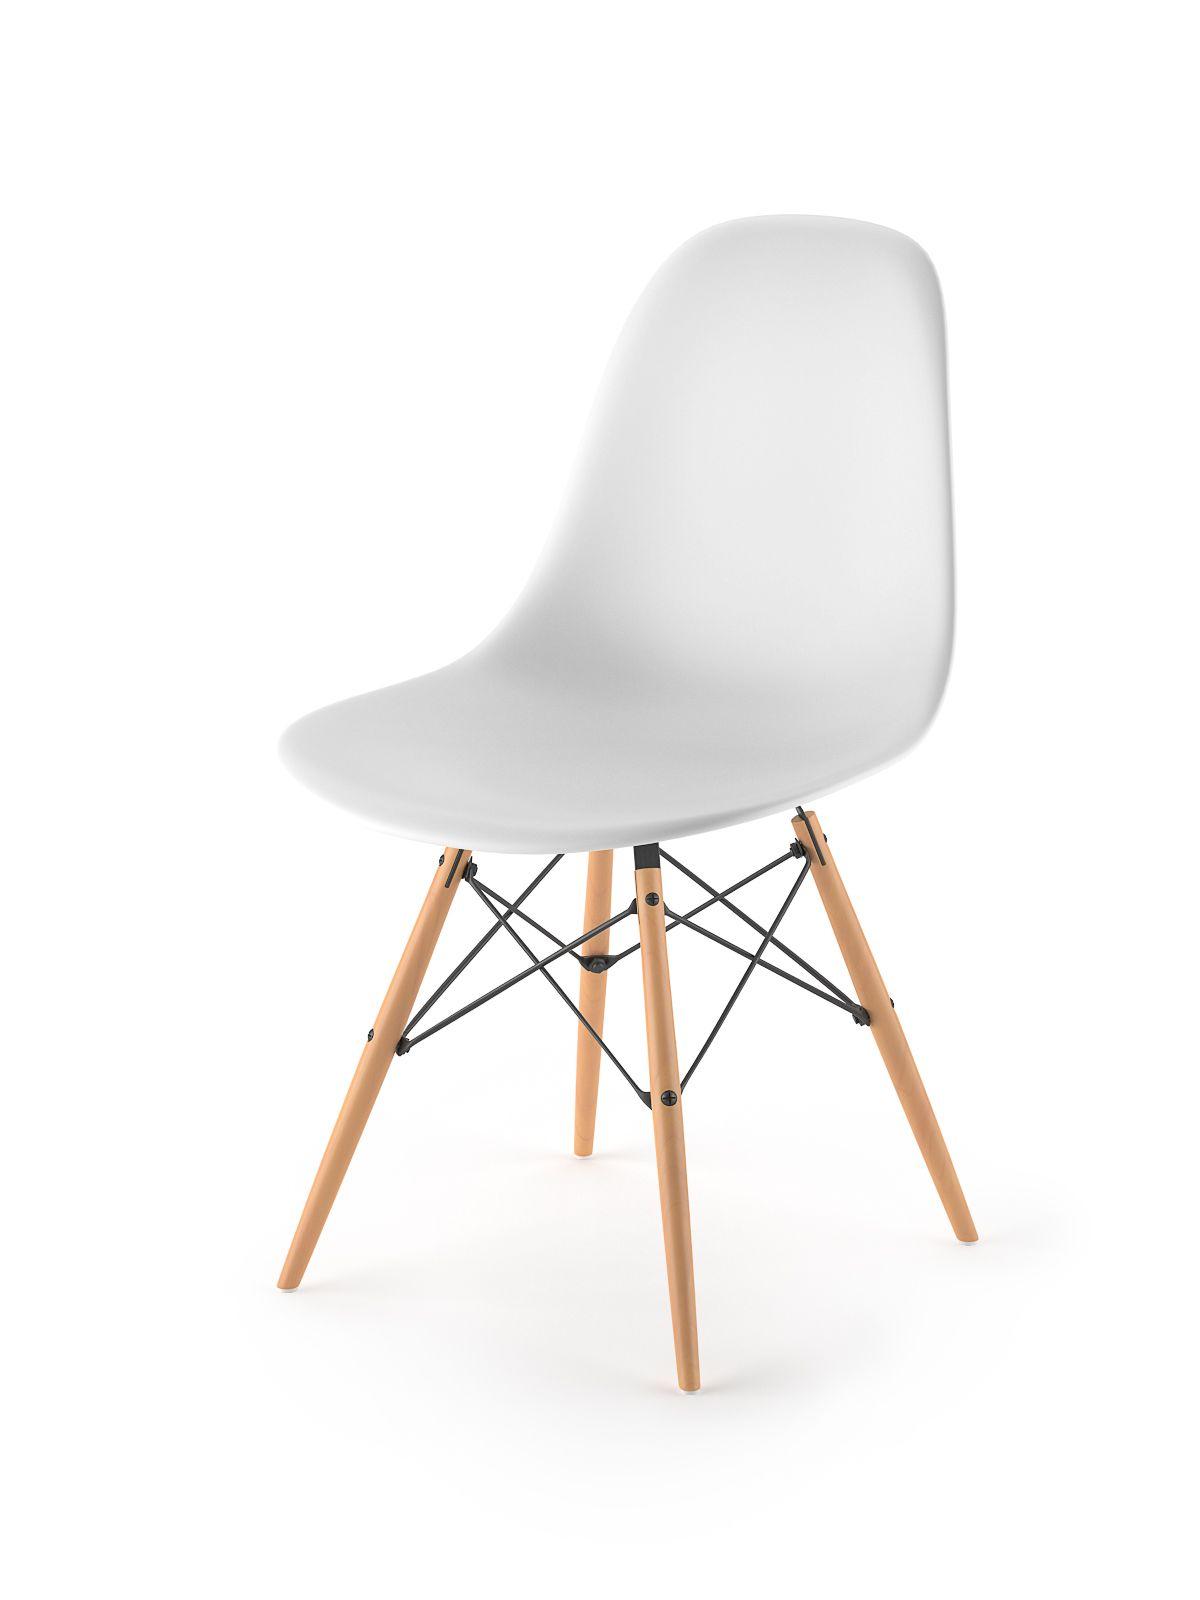 Cadeira Icon | Moveis Corporativos, Cadeiras Ergonomicas With Regard To Aalivia Slipper Chairs (View 7 of 15)